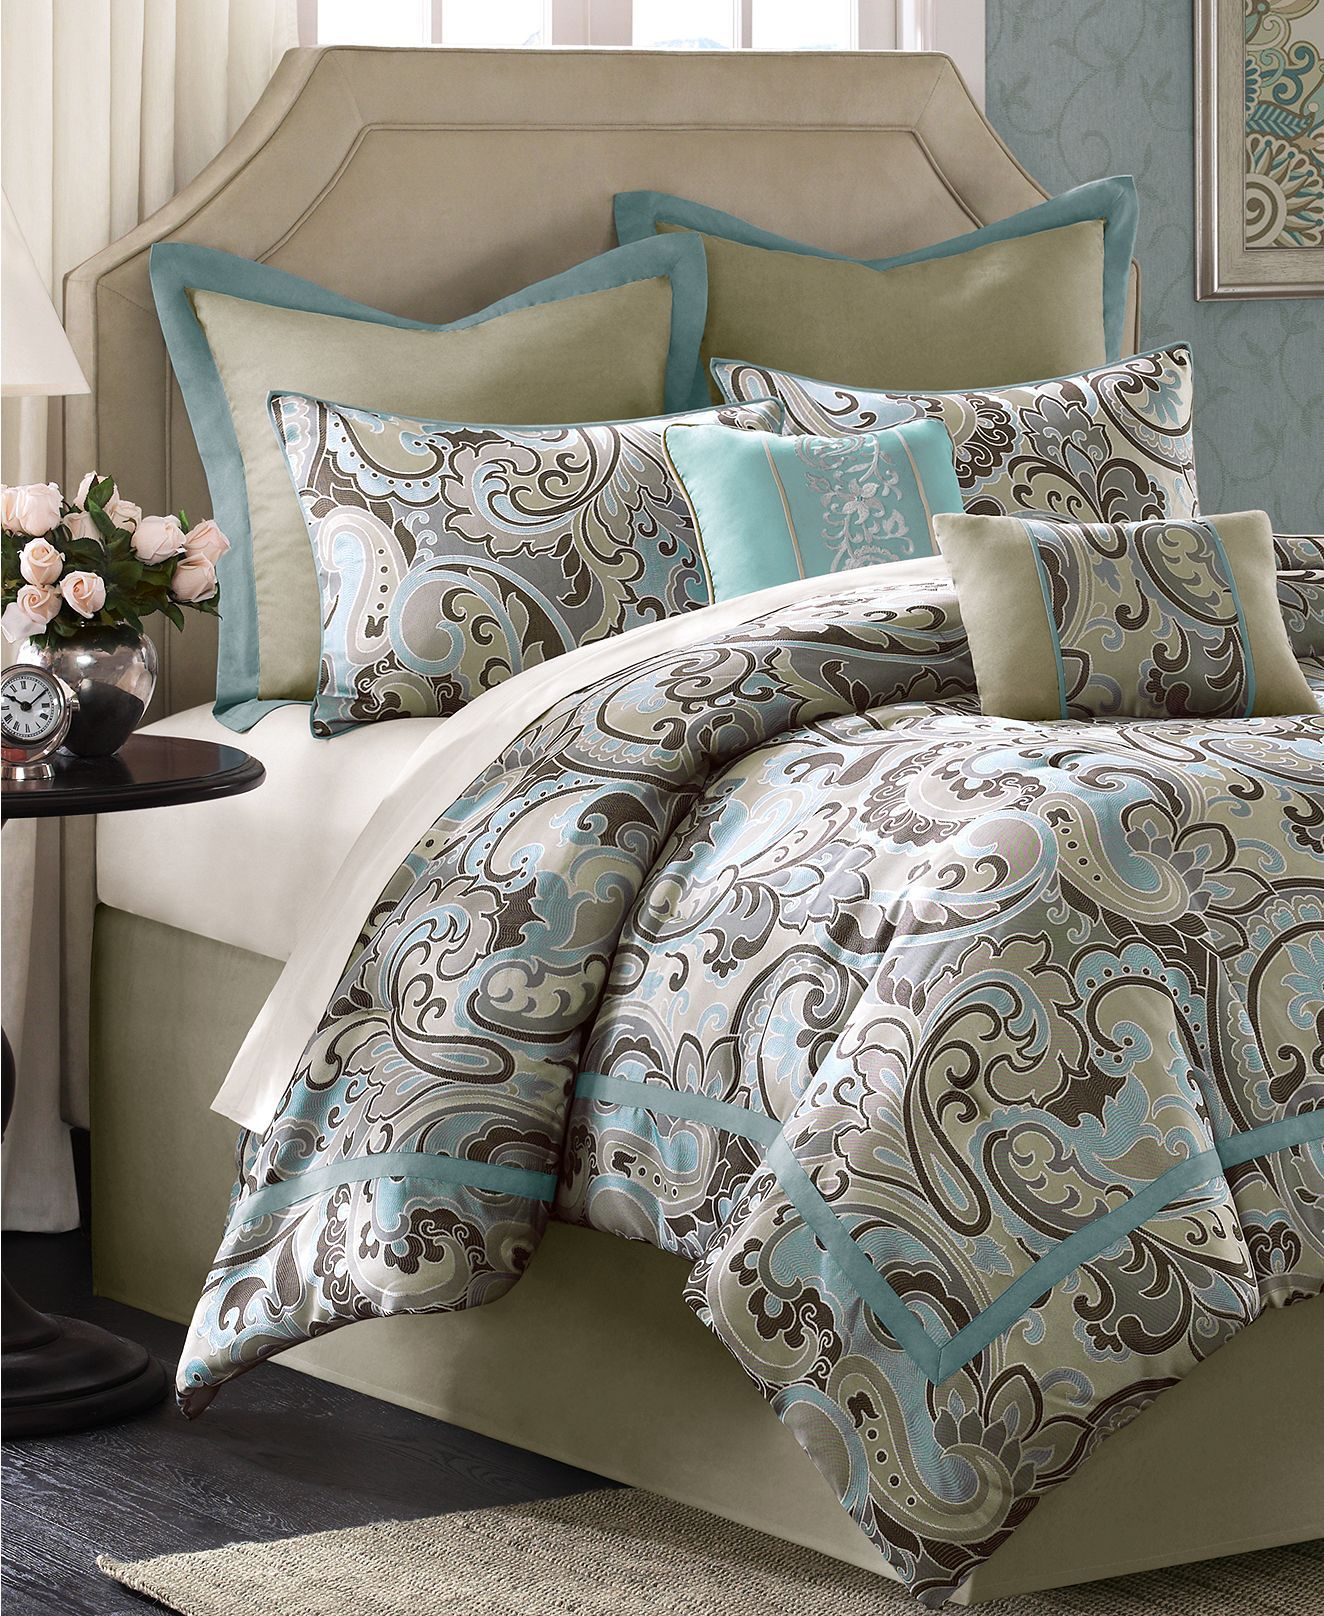 Kensington 8 Piece Comforter Set Bed In A Bag Bed